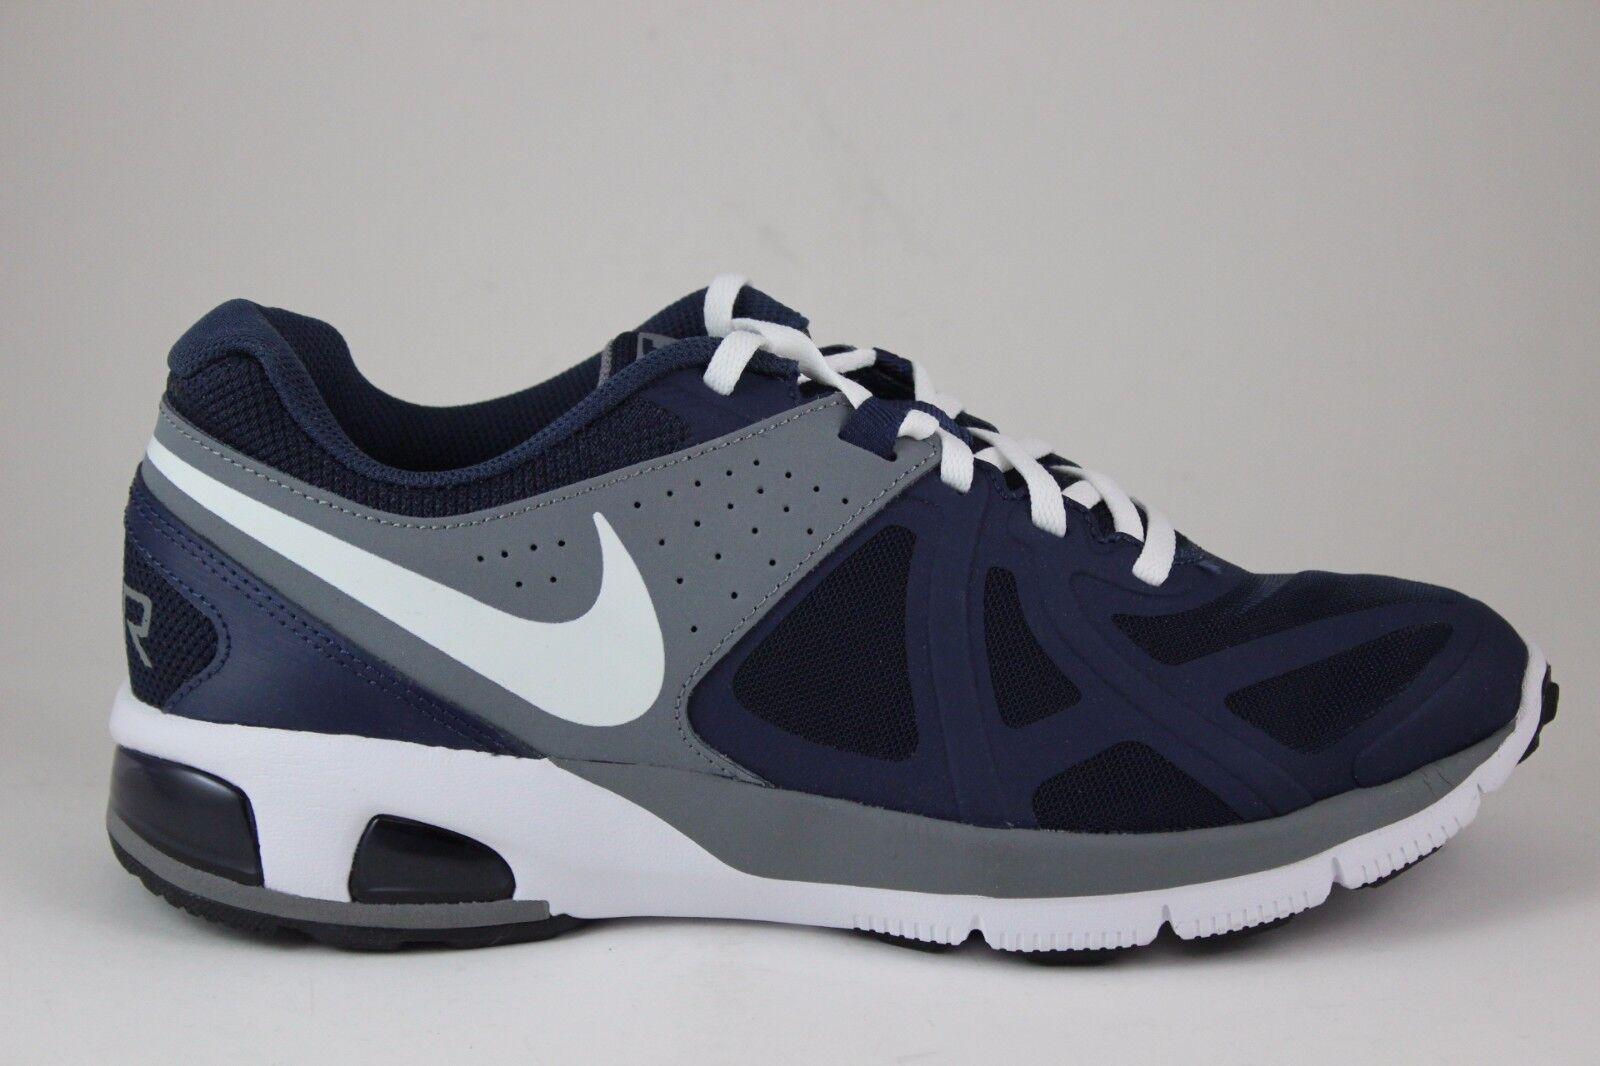 Nike Air Max Run Lite 5 631263401 Mid Navy / Ξ›Ξ΅Ο…ΞΊΟŒ-Cool Γκρι-Obsidian Νέο σΡ κουτί